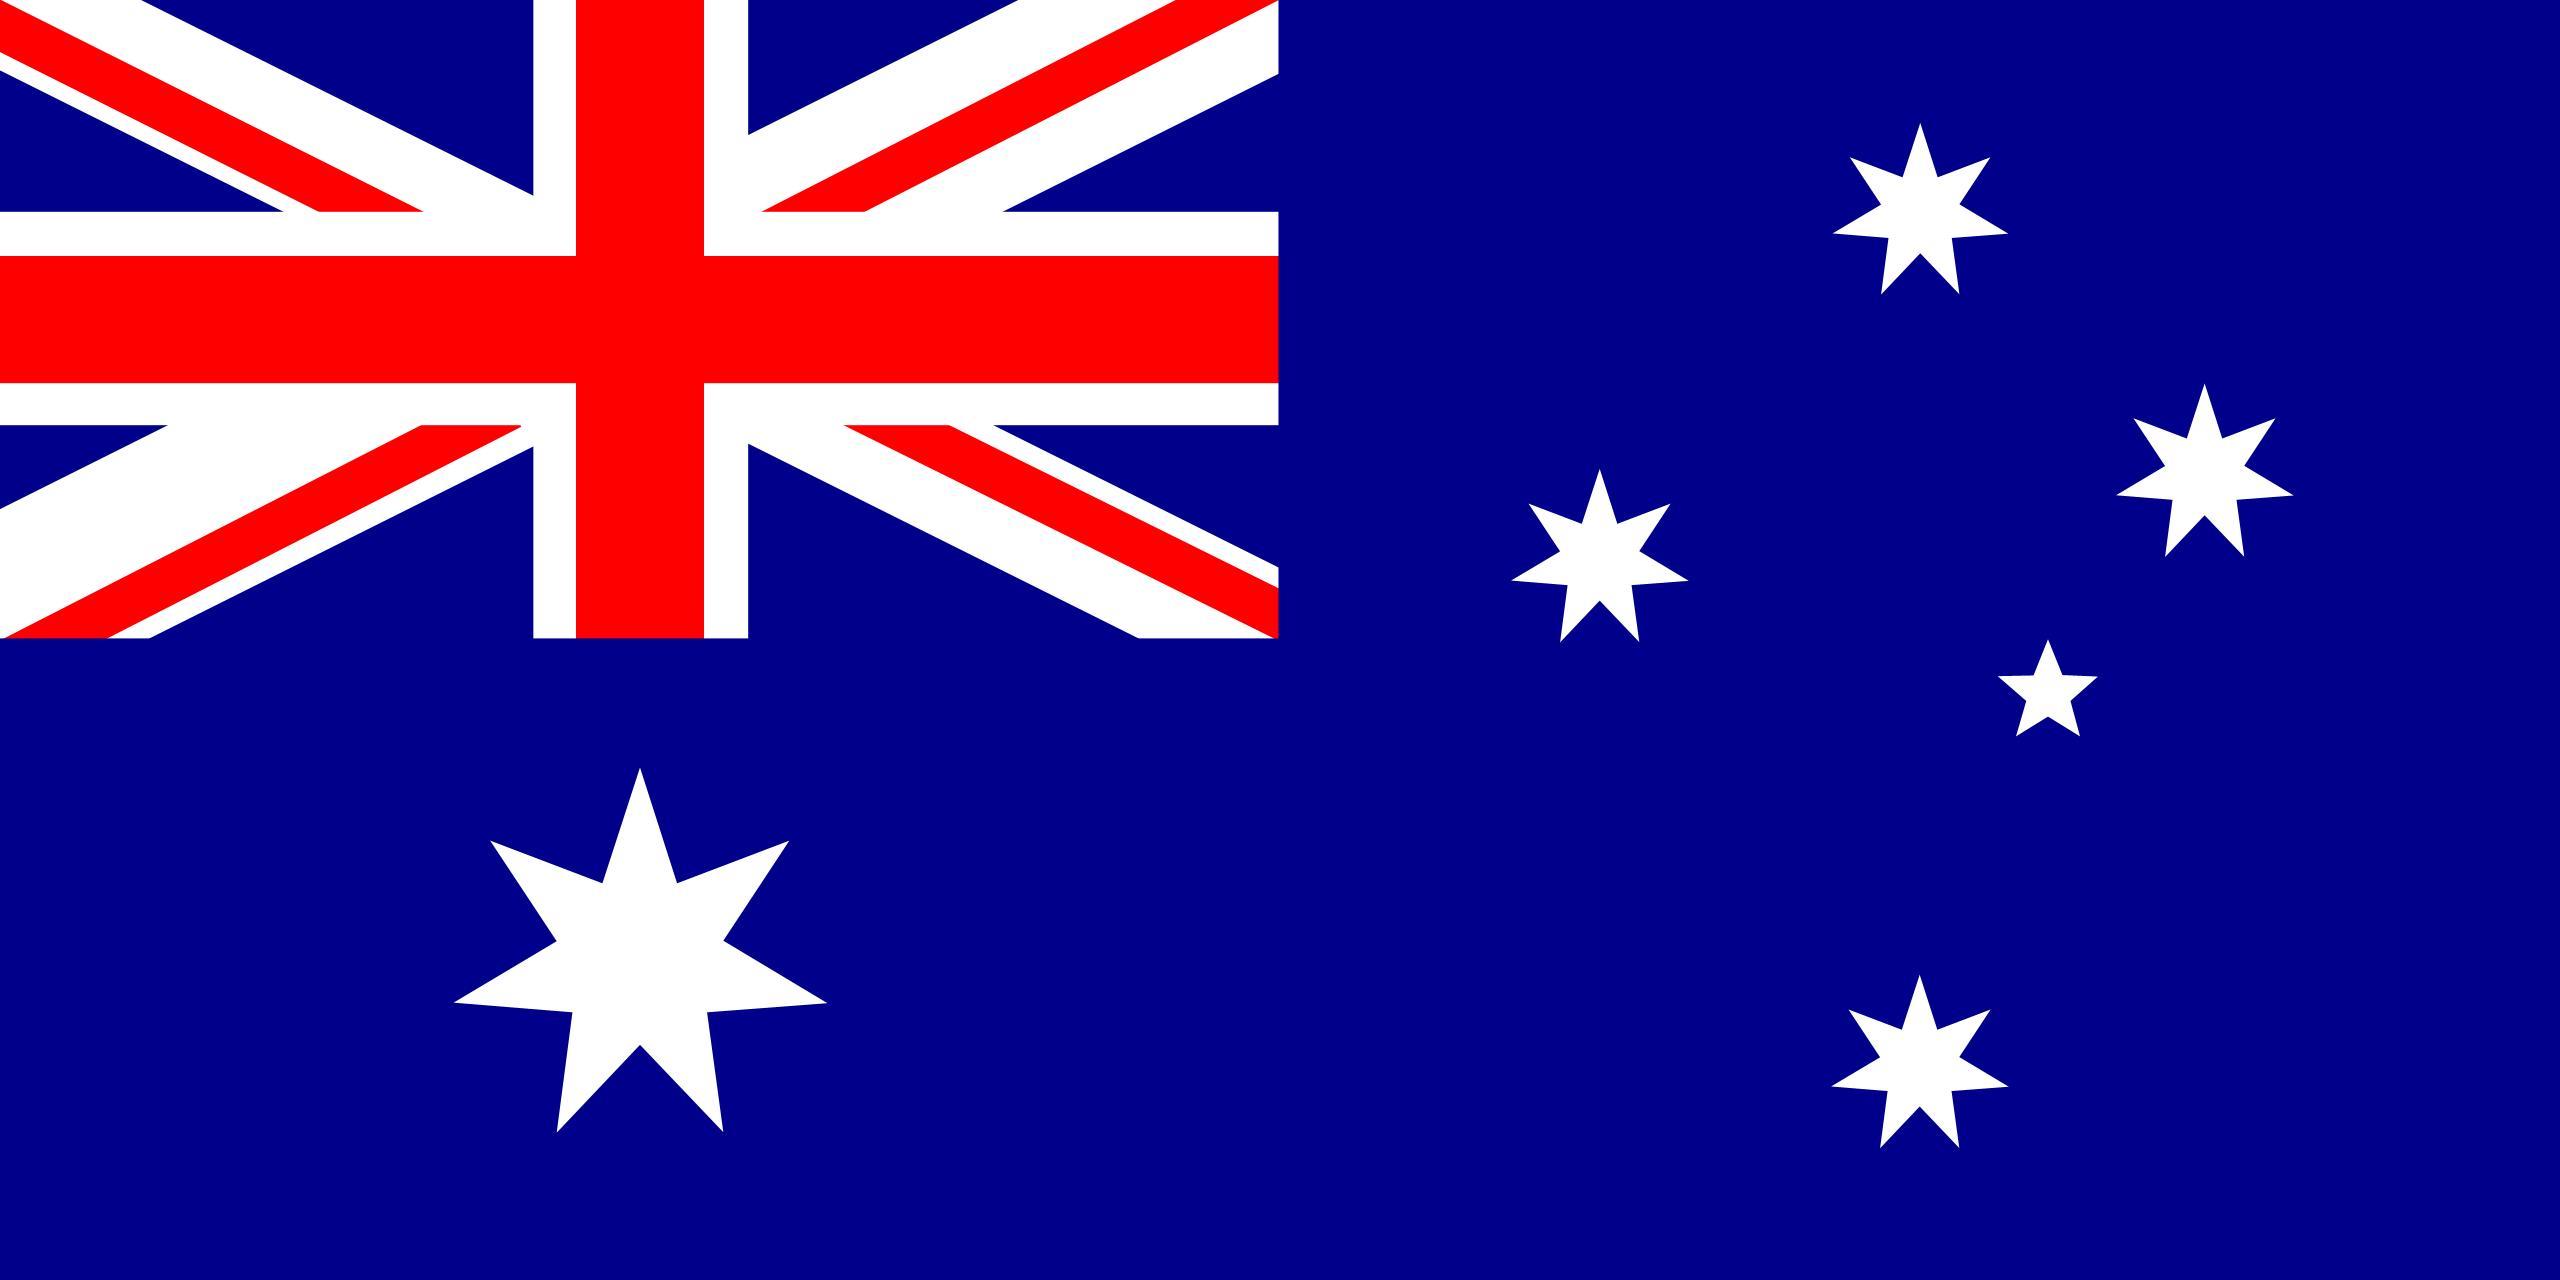 High Resolution Flag: High Quality Australian Flag By Anklyne On DeviantArt